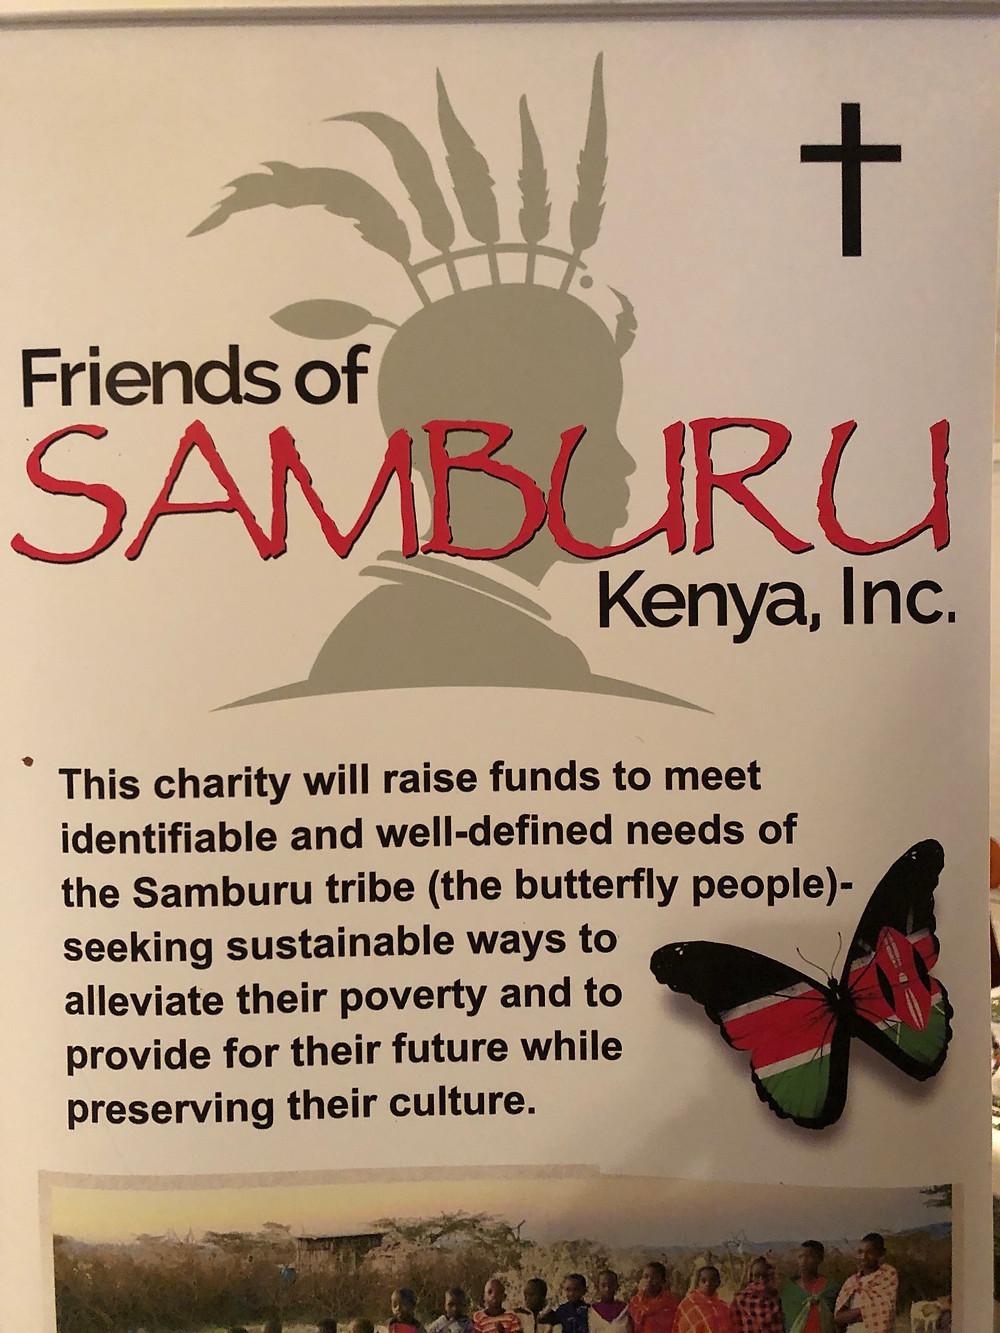 Friends of Samburu